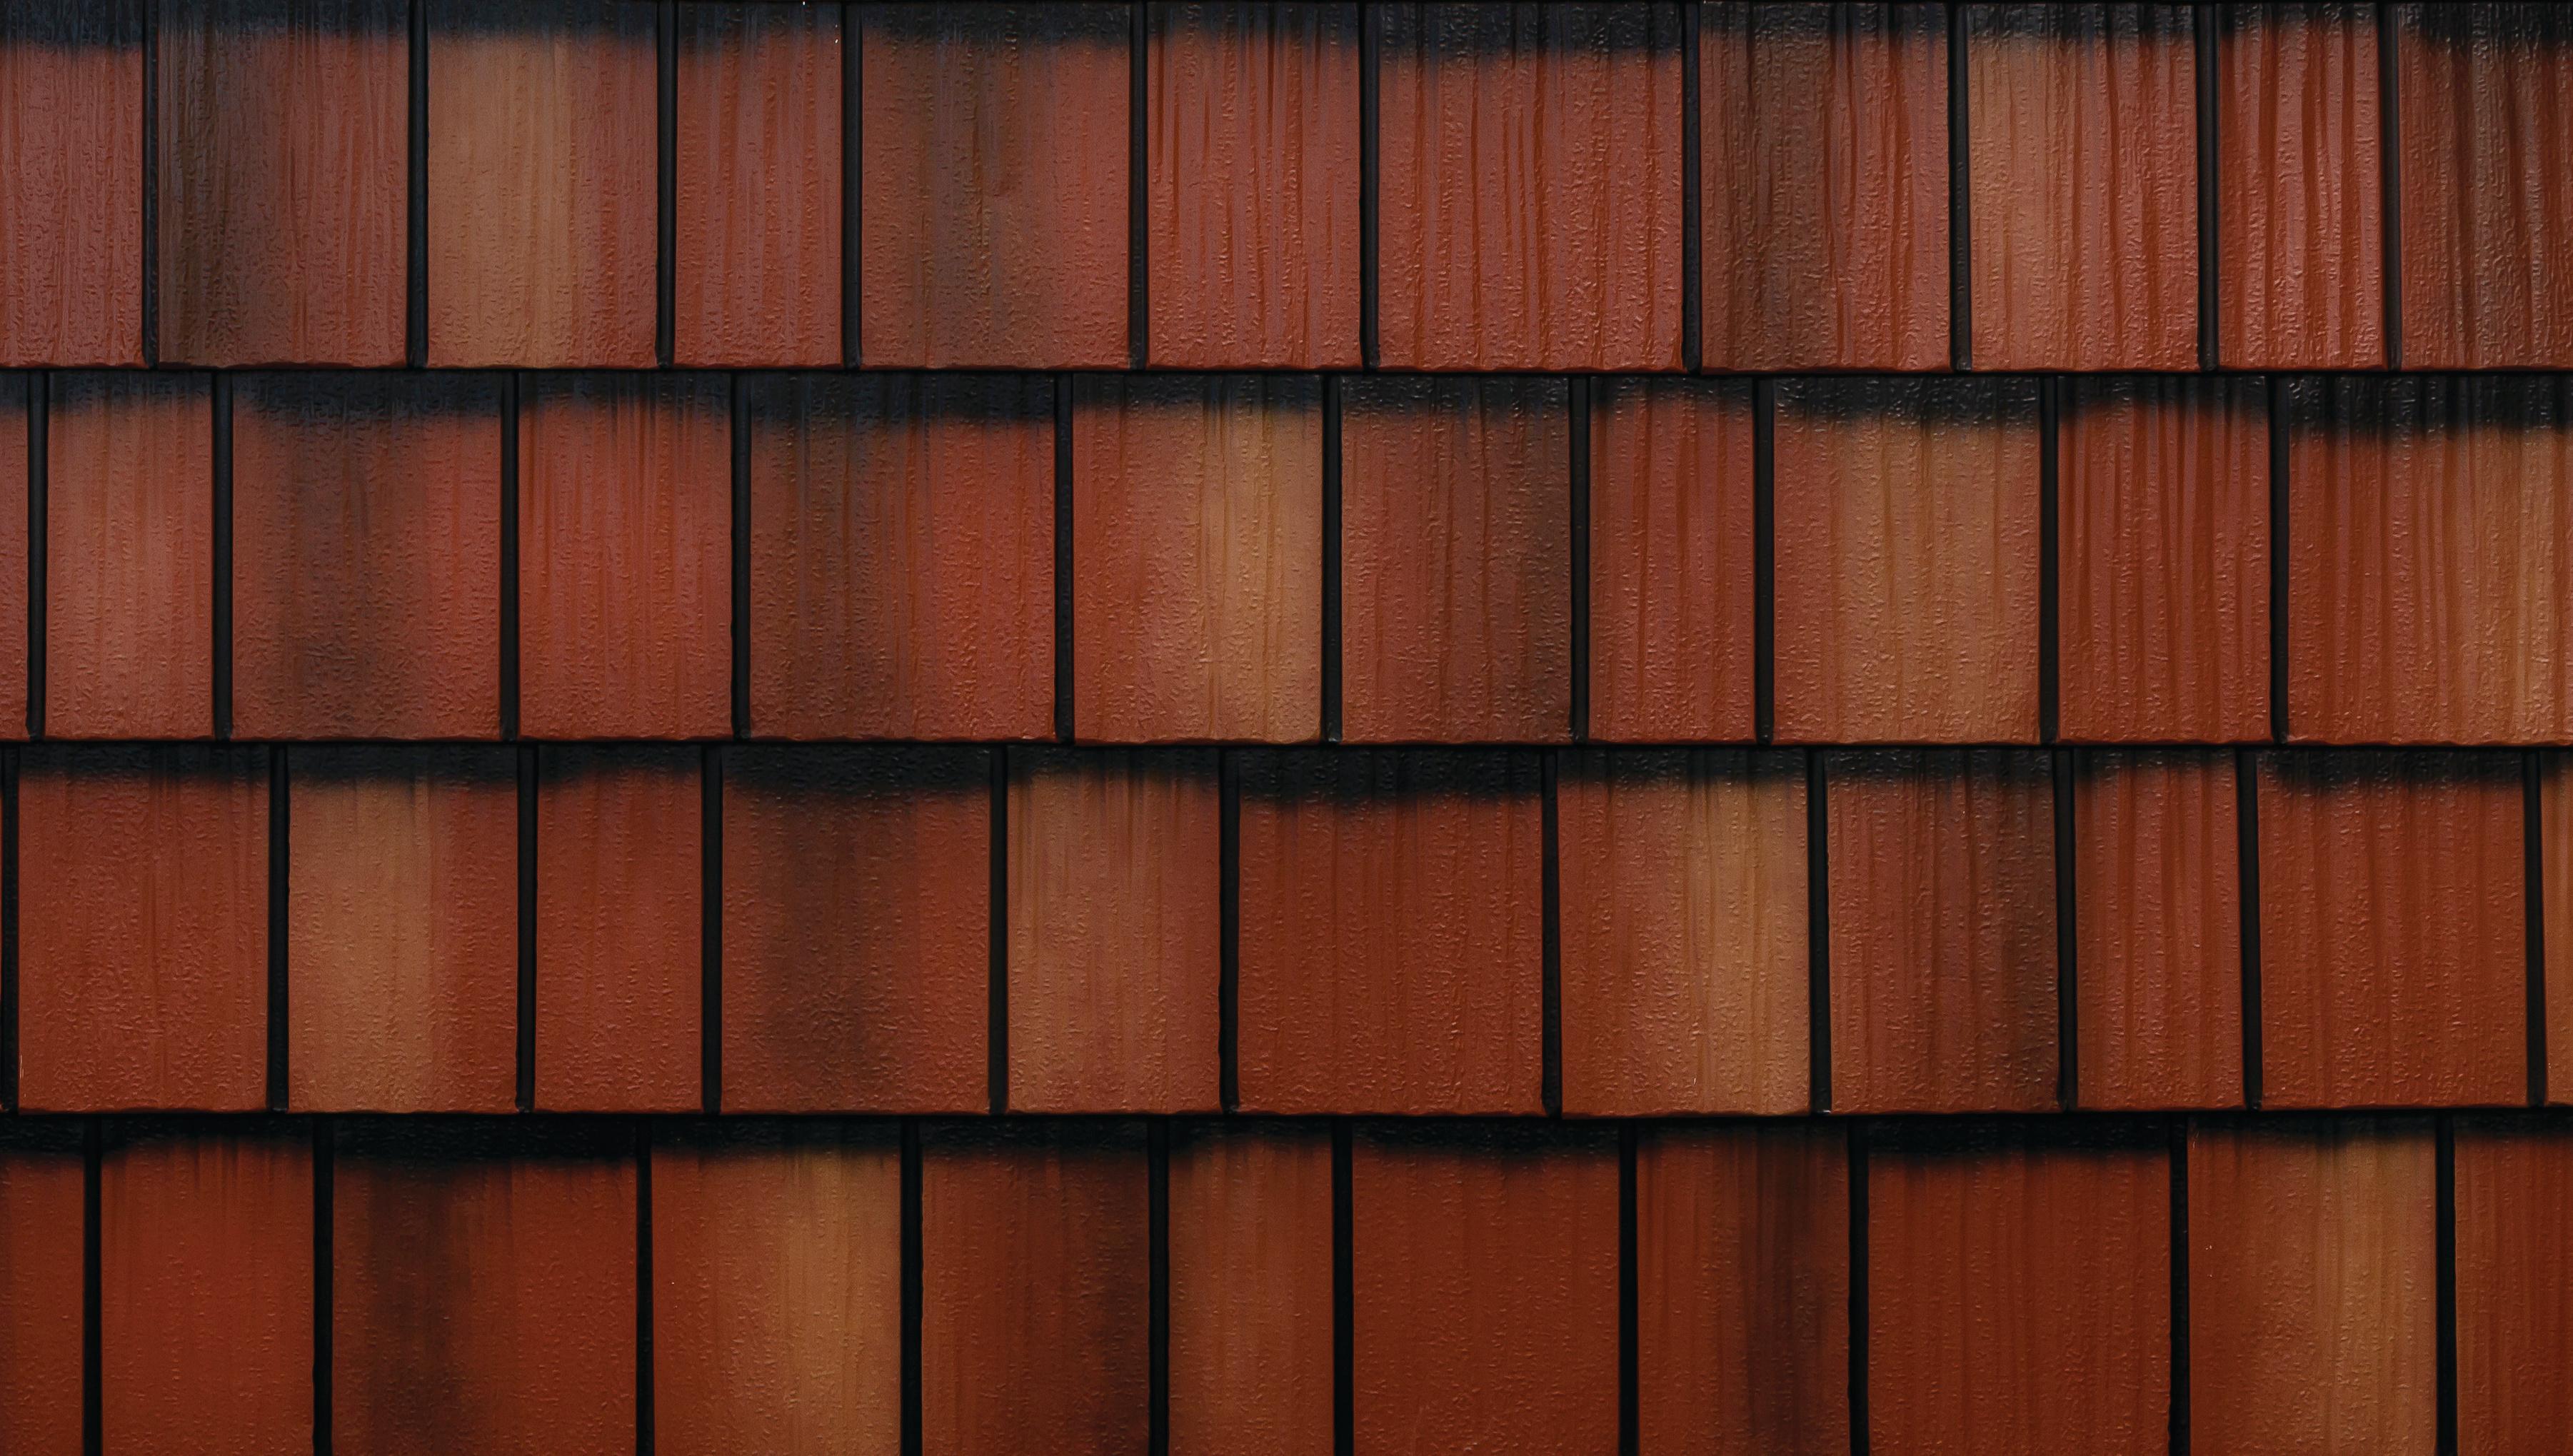 Acr Metal Roofing Amp Siding Distributors Edco 717 933 7044